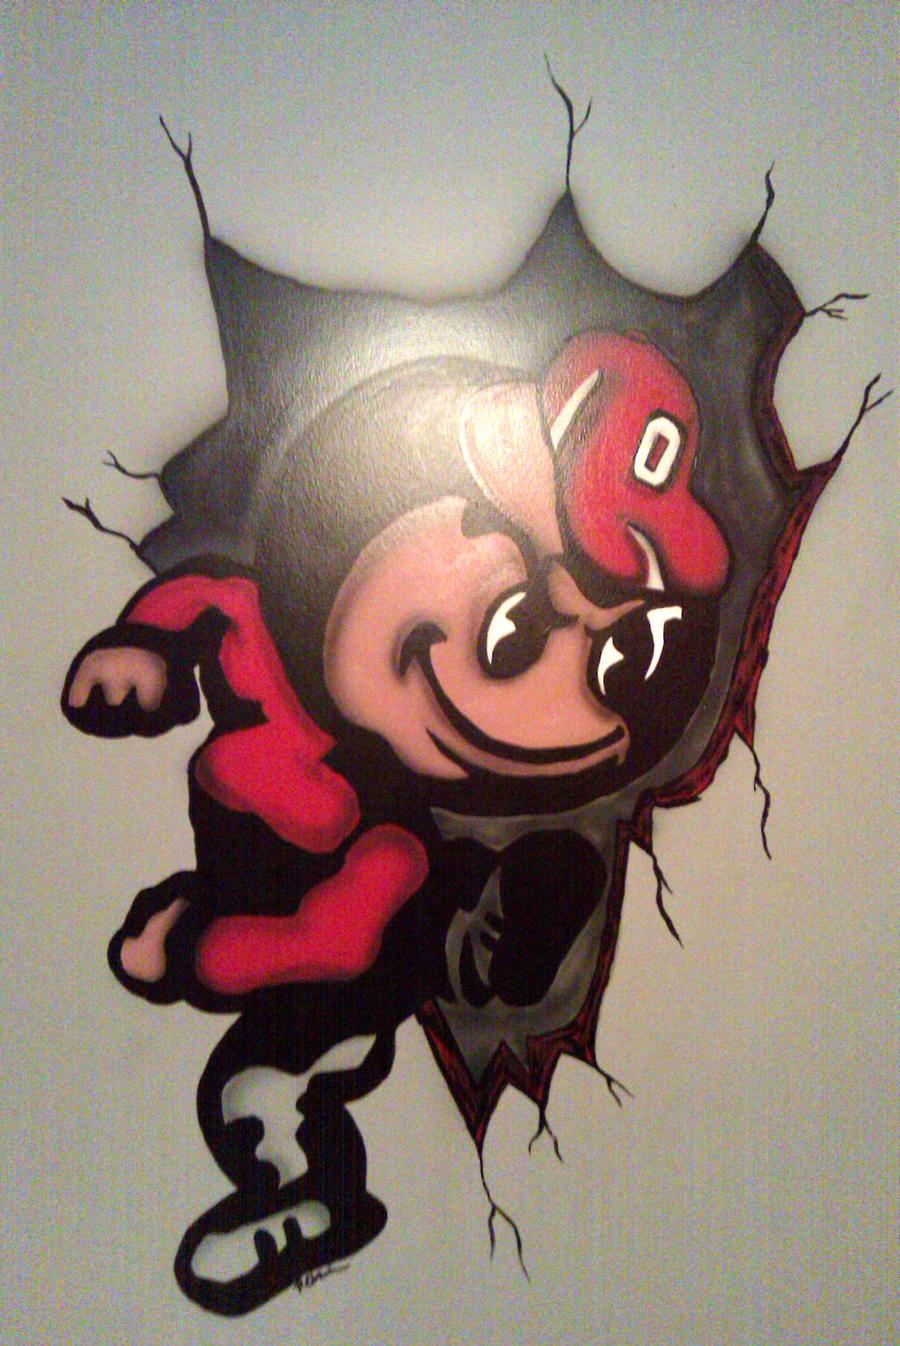 brutus buckeye wall mural by rynocreations on deviantart ohio state brutus buckeye mural by fathead